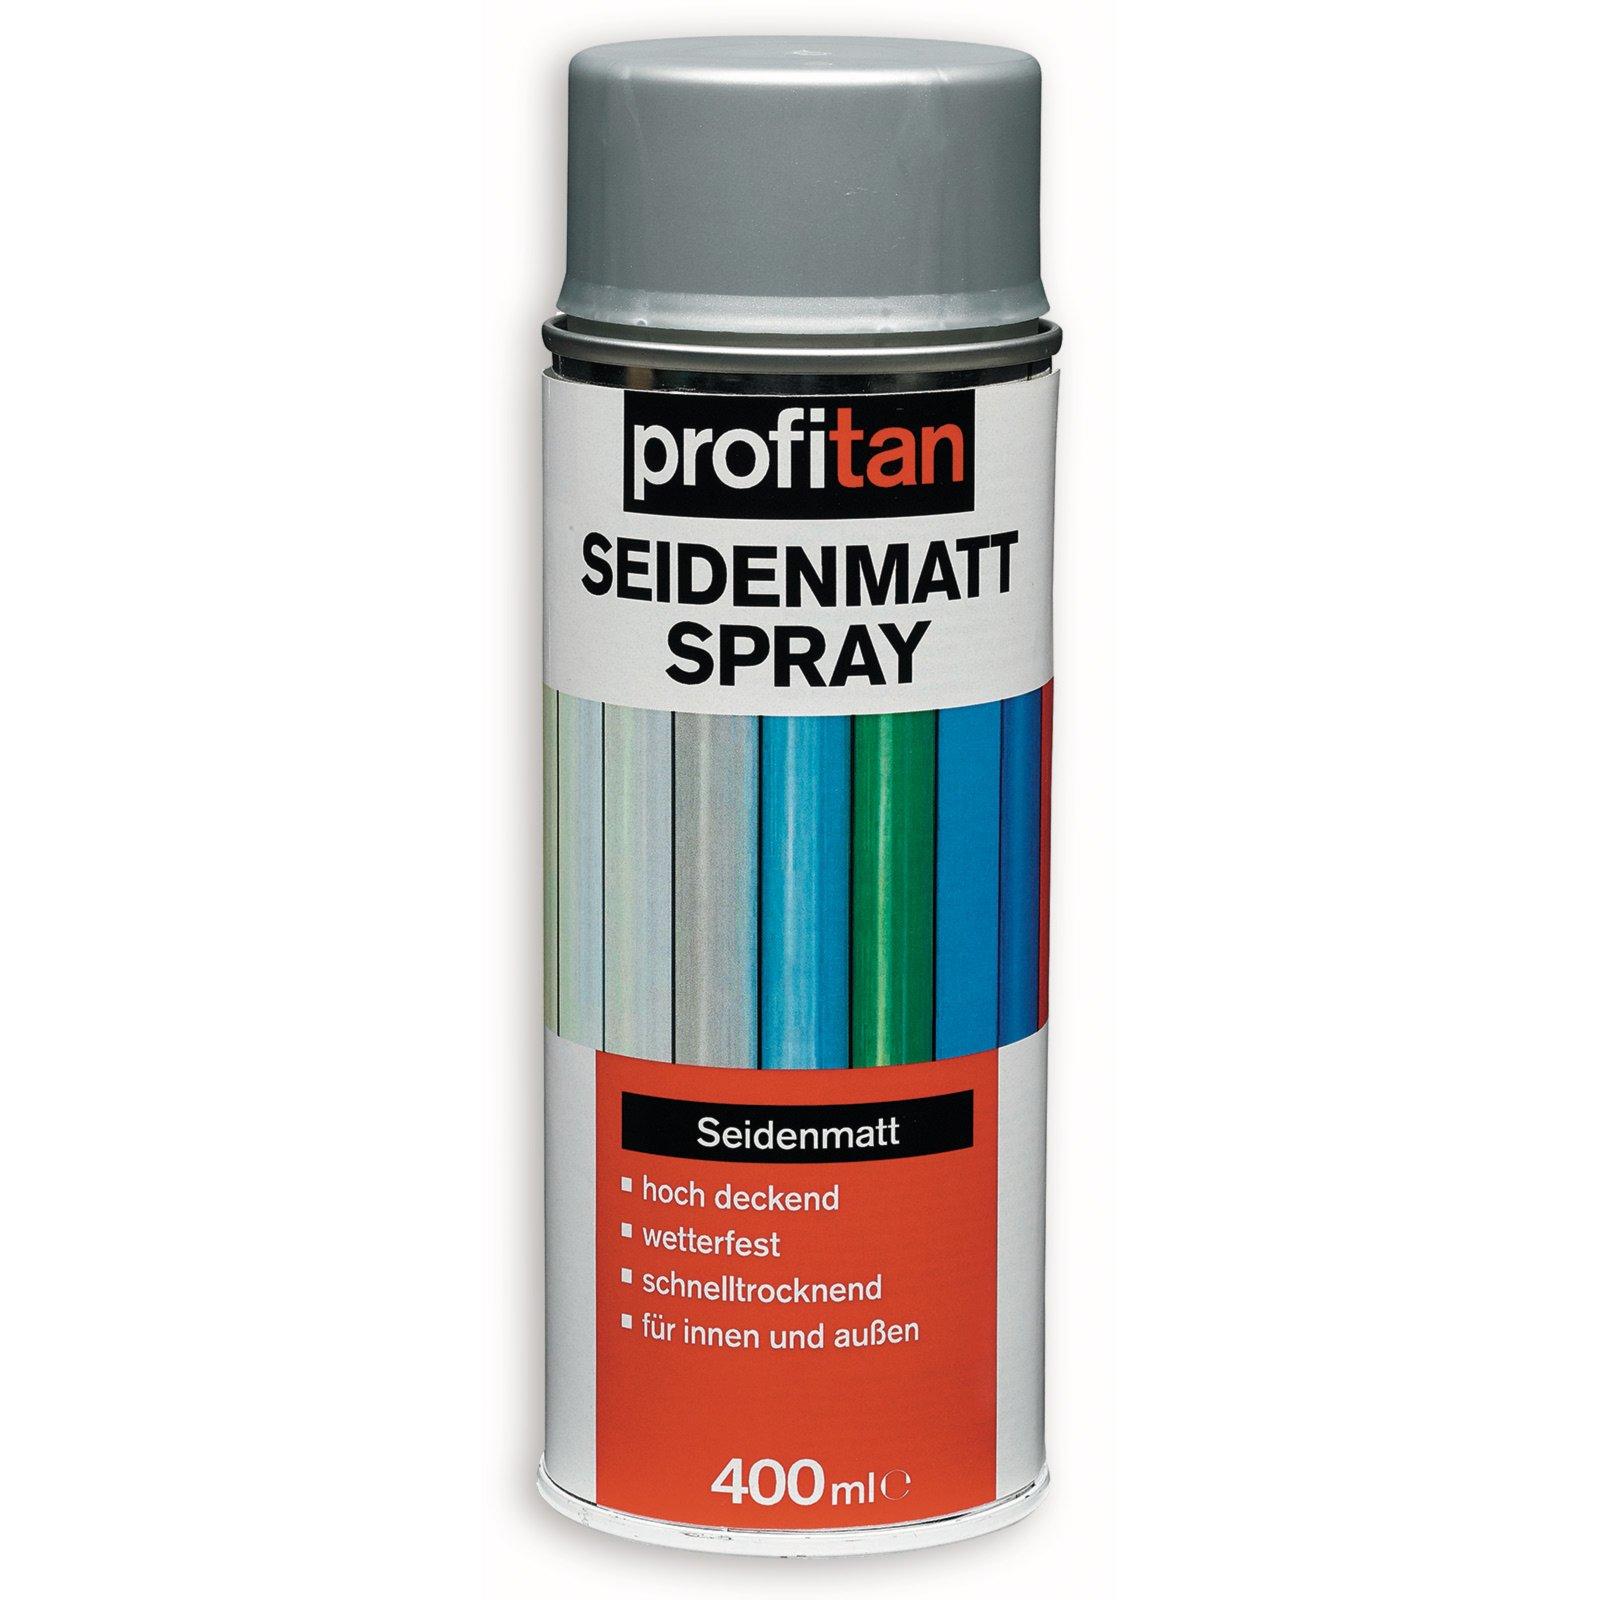 profitan Seidenmattspray - silbergrau - 400 ml